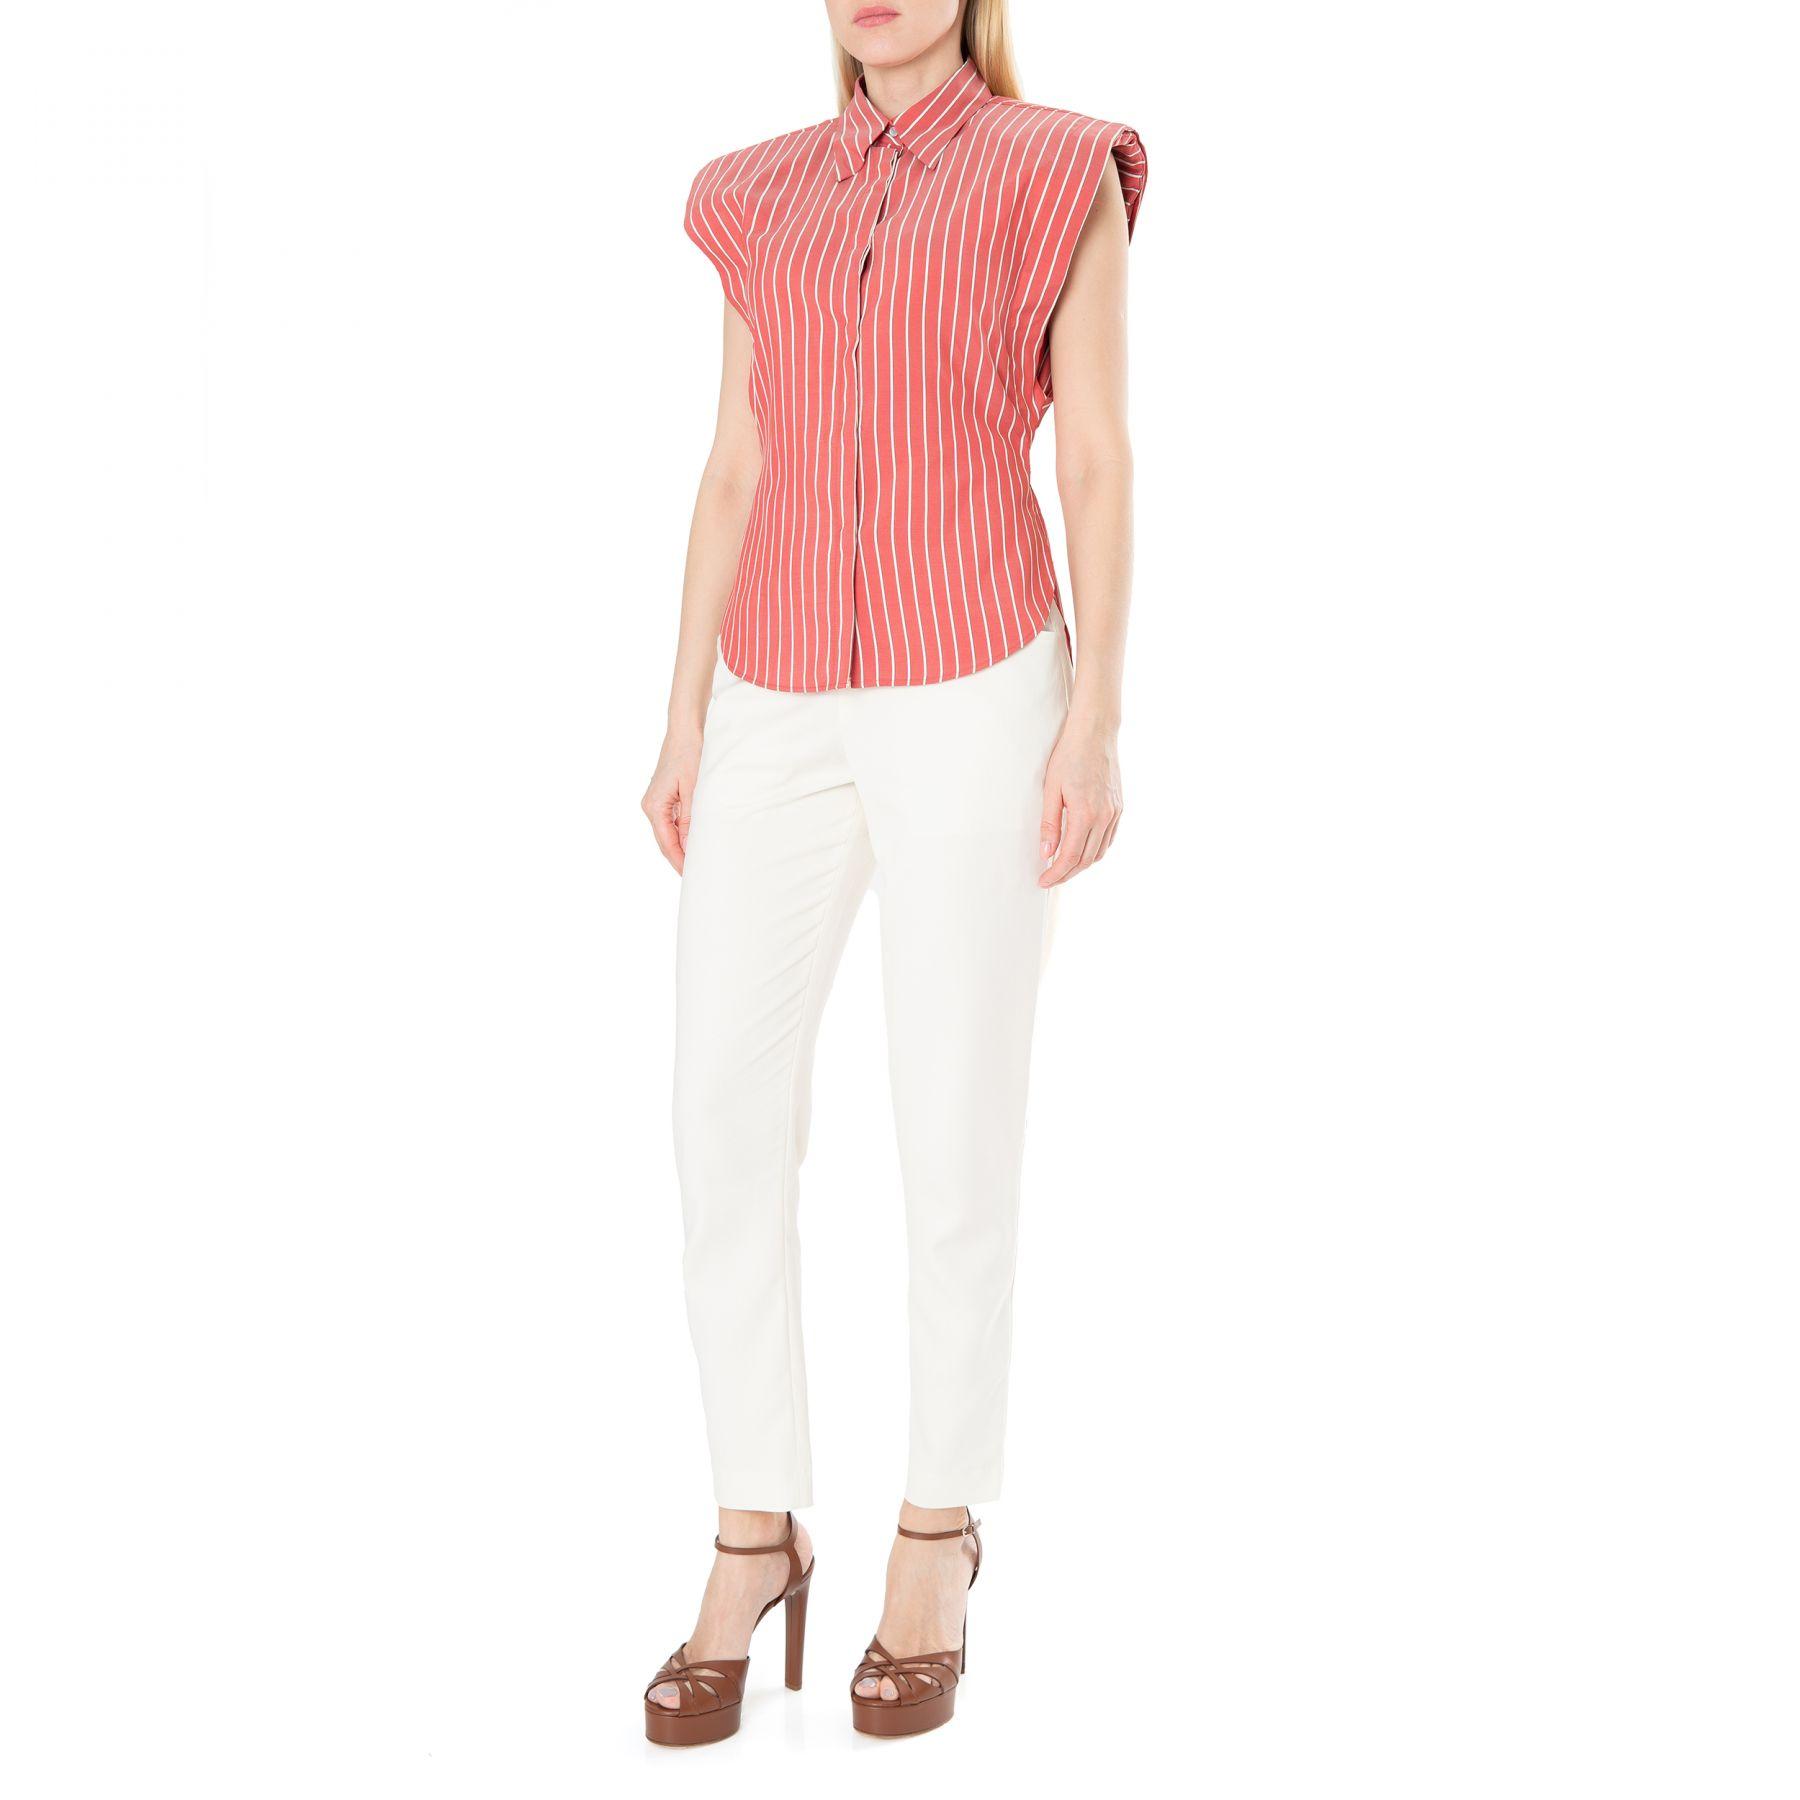 Рубашка с короткими рукавами Isabel Marant Enza красная